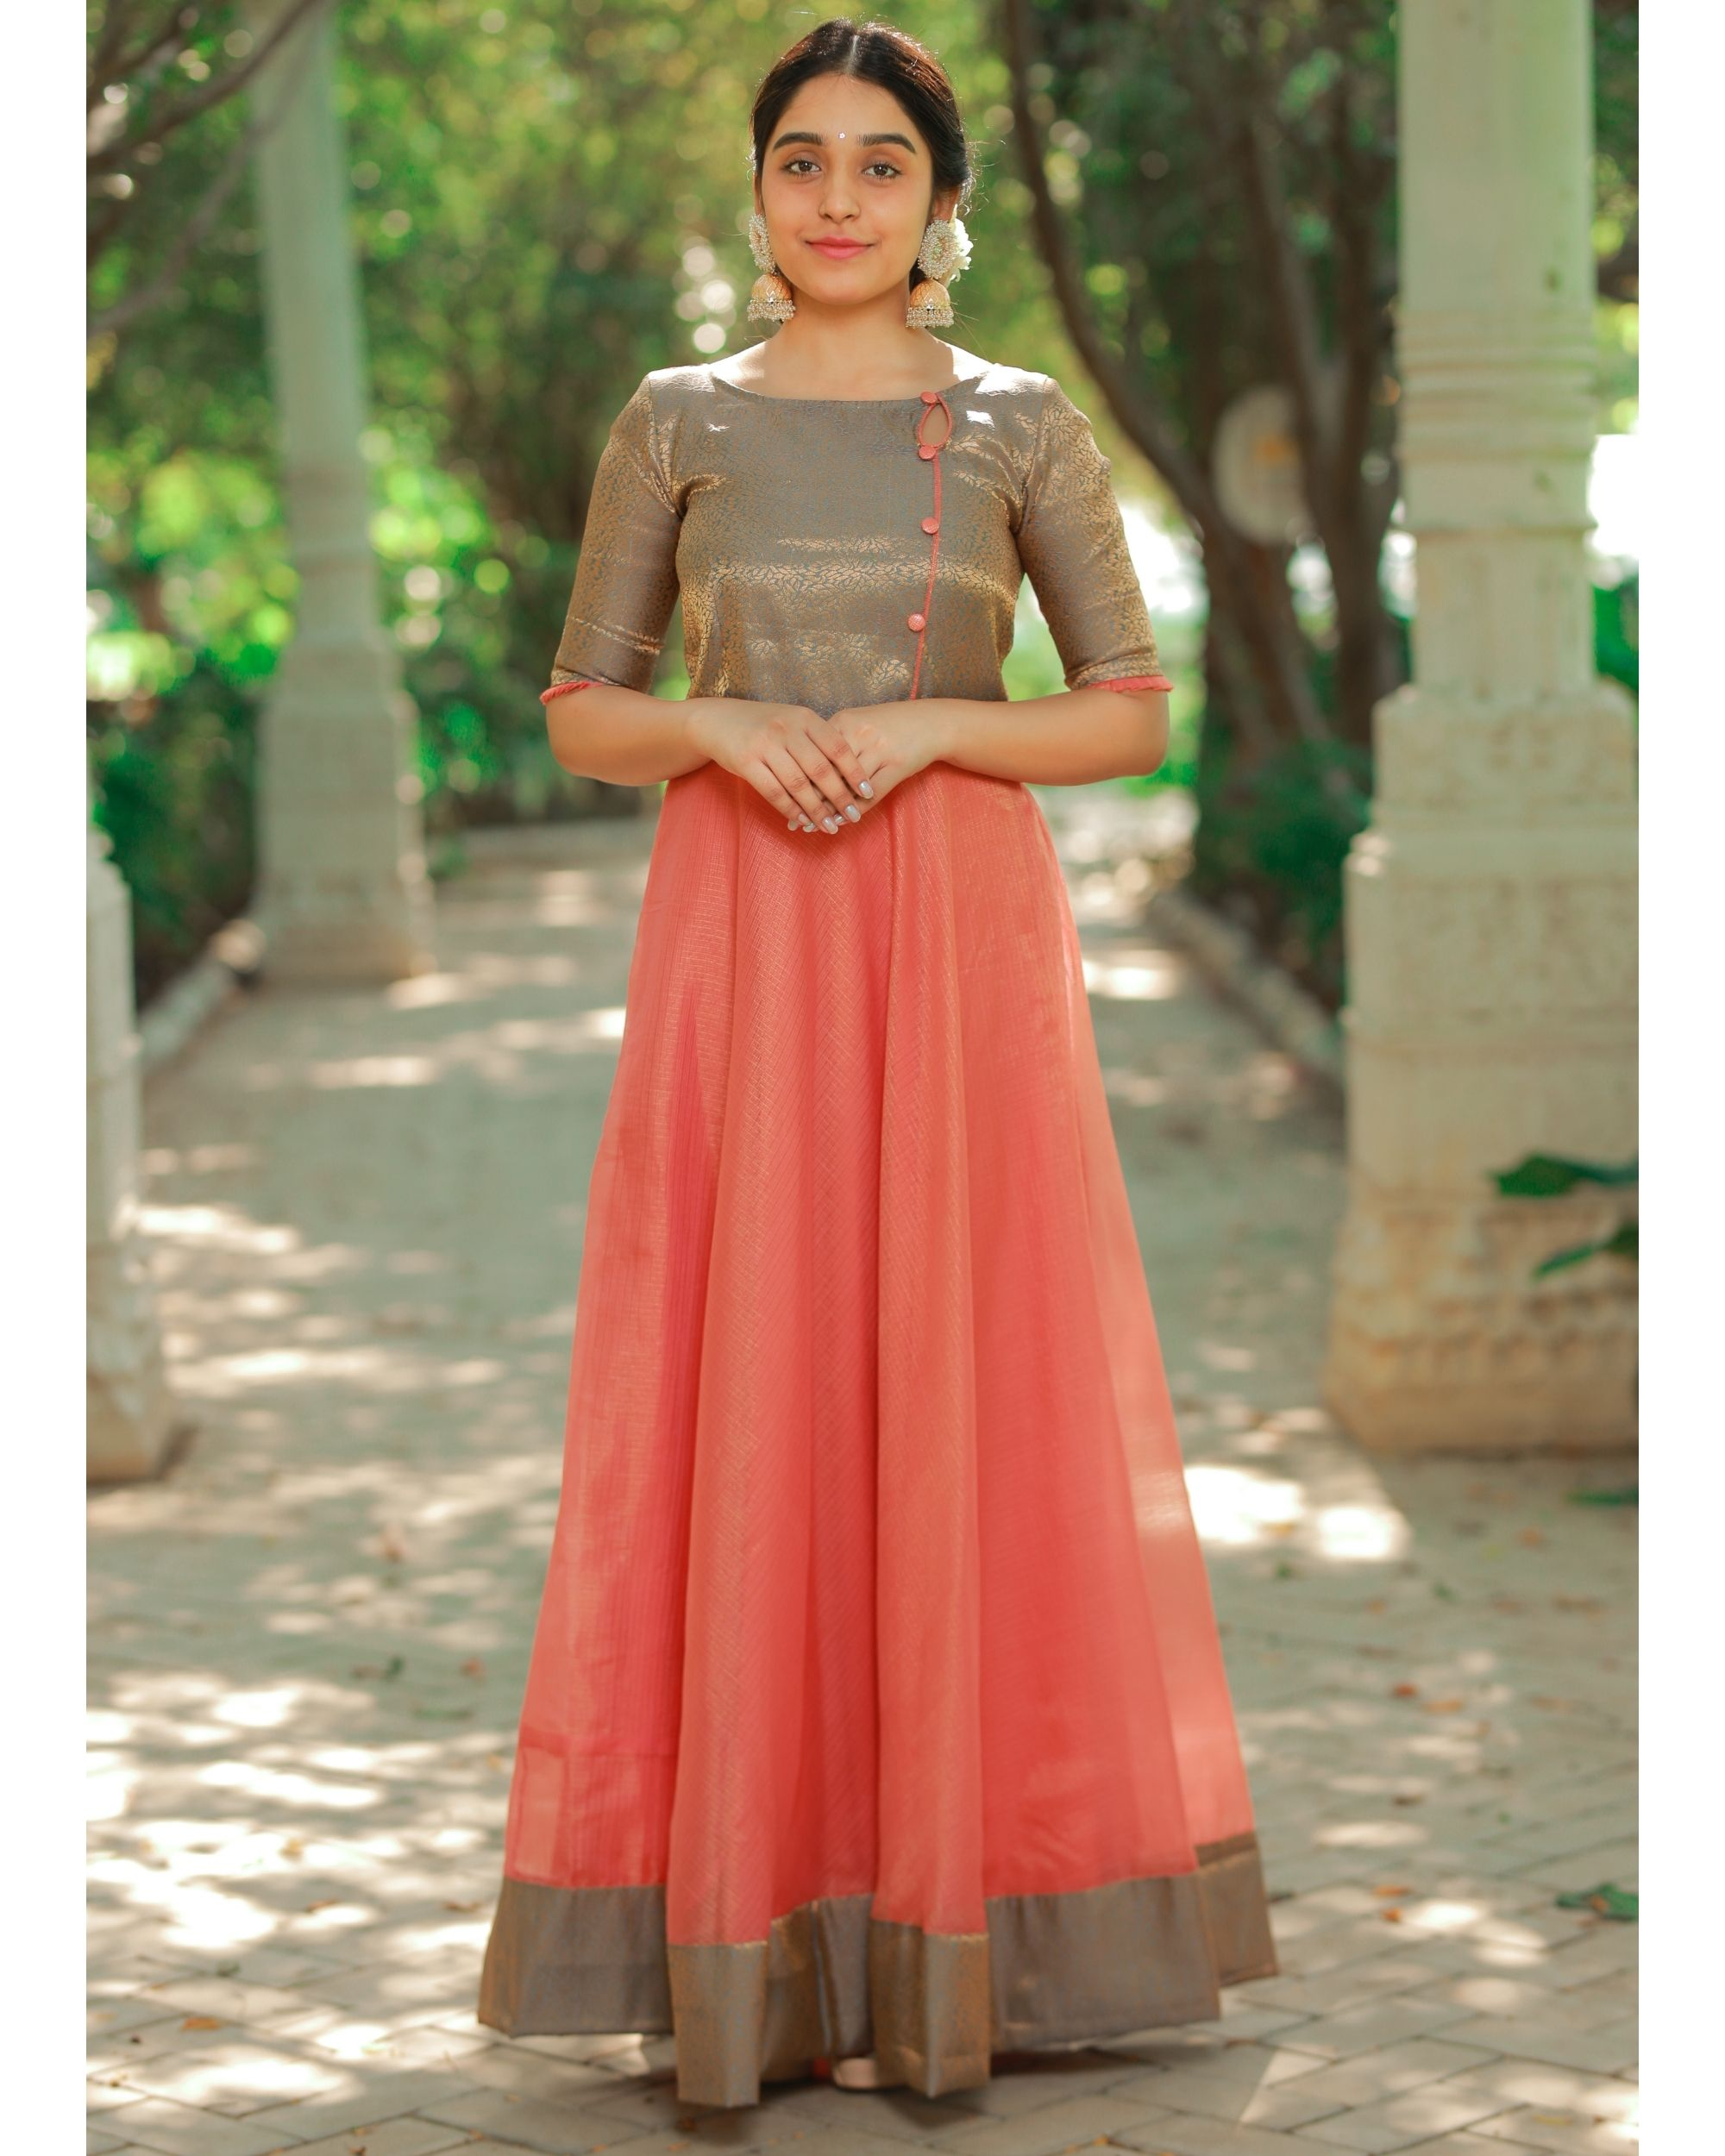 Peach and brown flared yoke maxi dress